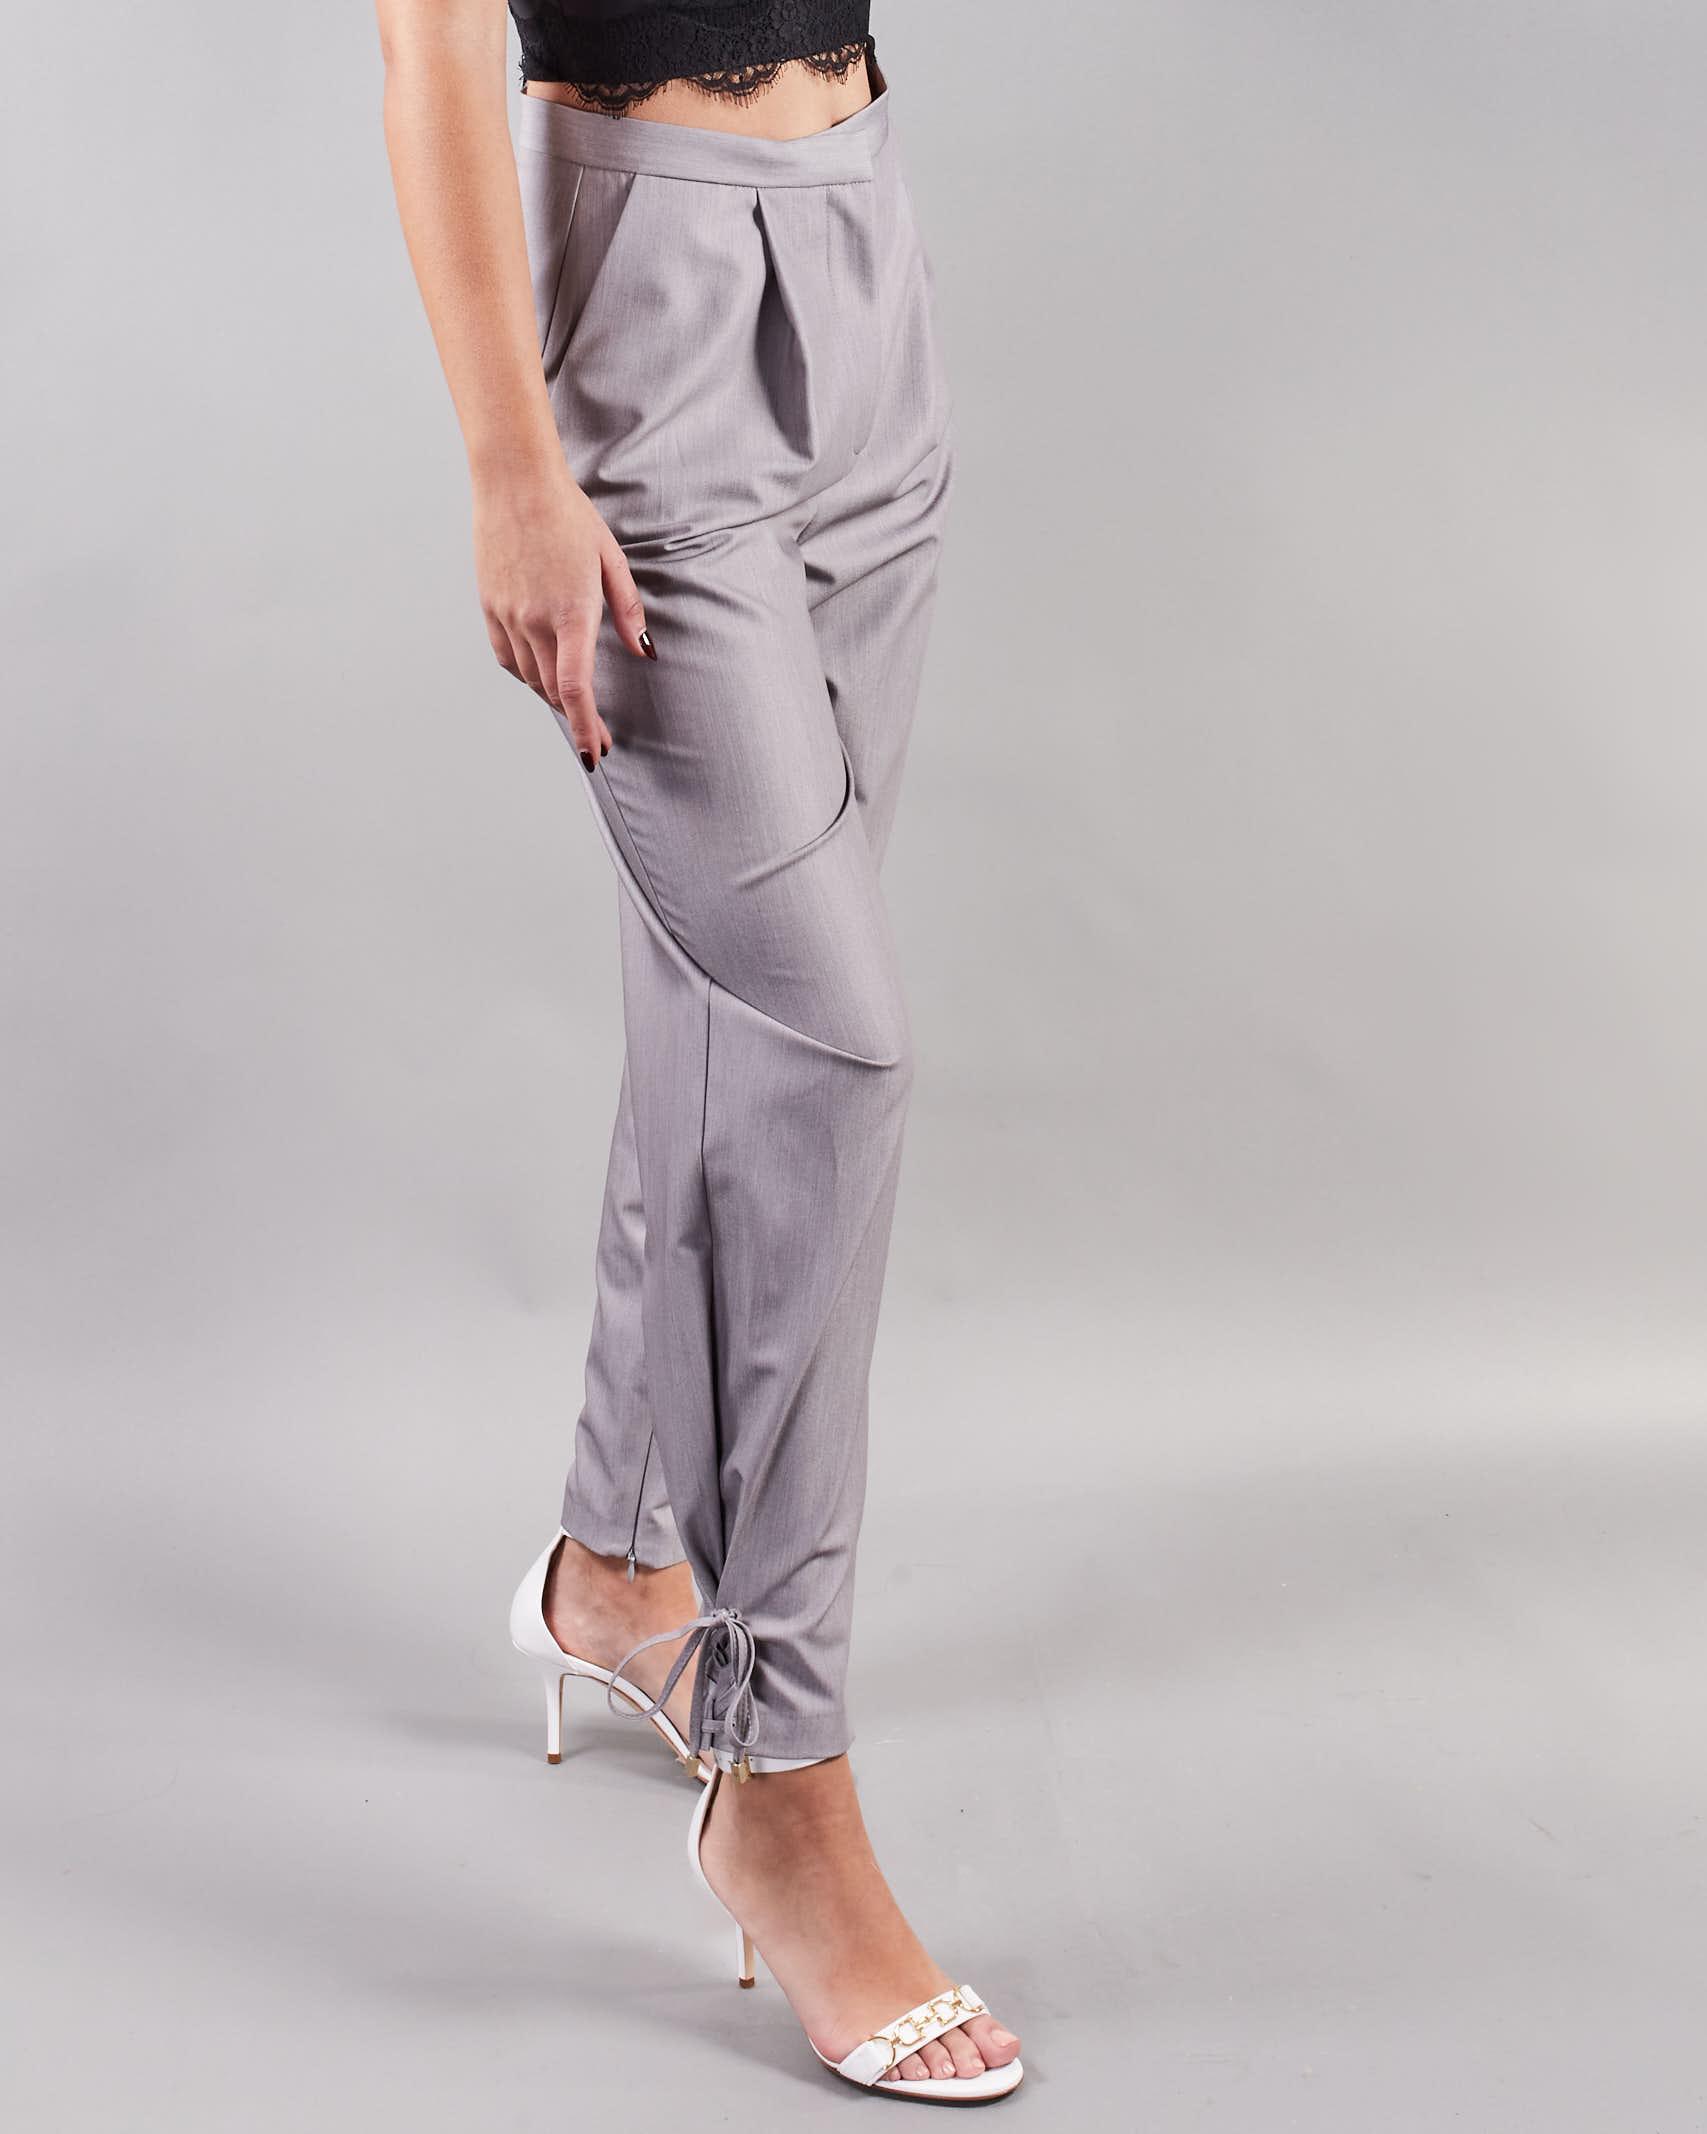 Pantalone con pences Simona Corsellini SIMONA CORSELLINI | Pantalone | PA00602TTEL0002505